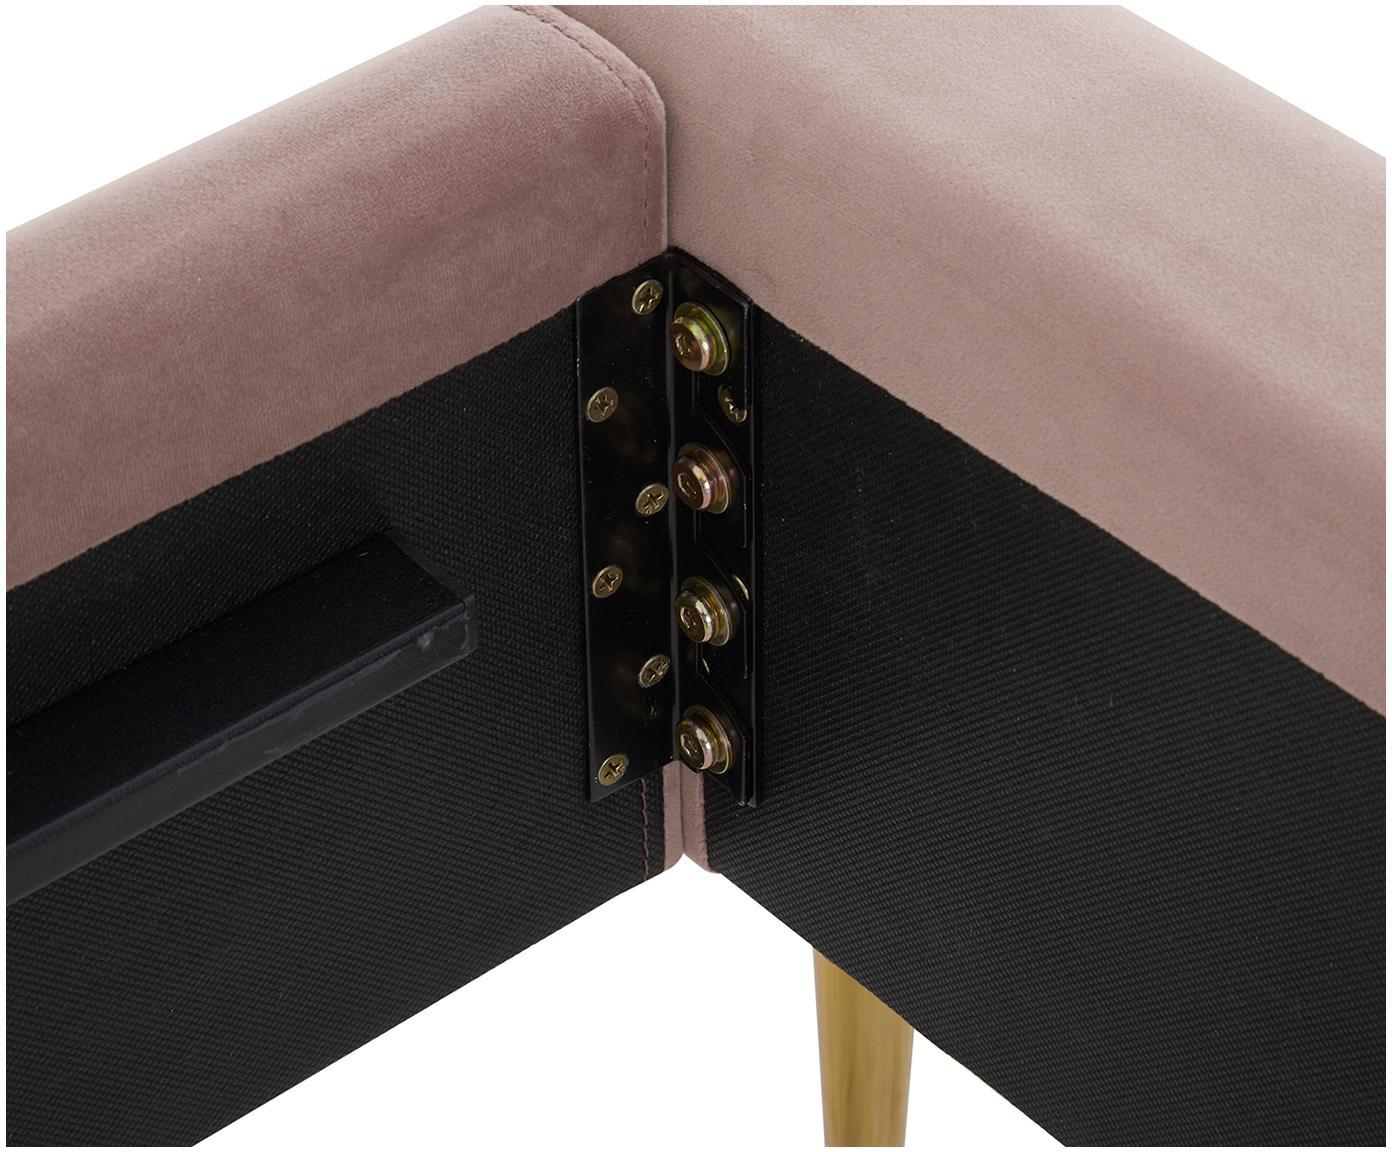 Gestoffeerd fluwelen bed Glamour, Frame: massief grenenhout, Poten: vermessingd metaal, Bekleding: fluweel (polyester), Bekleding: oudroze. Poten: glanzend goudkleurig, 160 x 200 cm